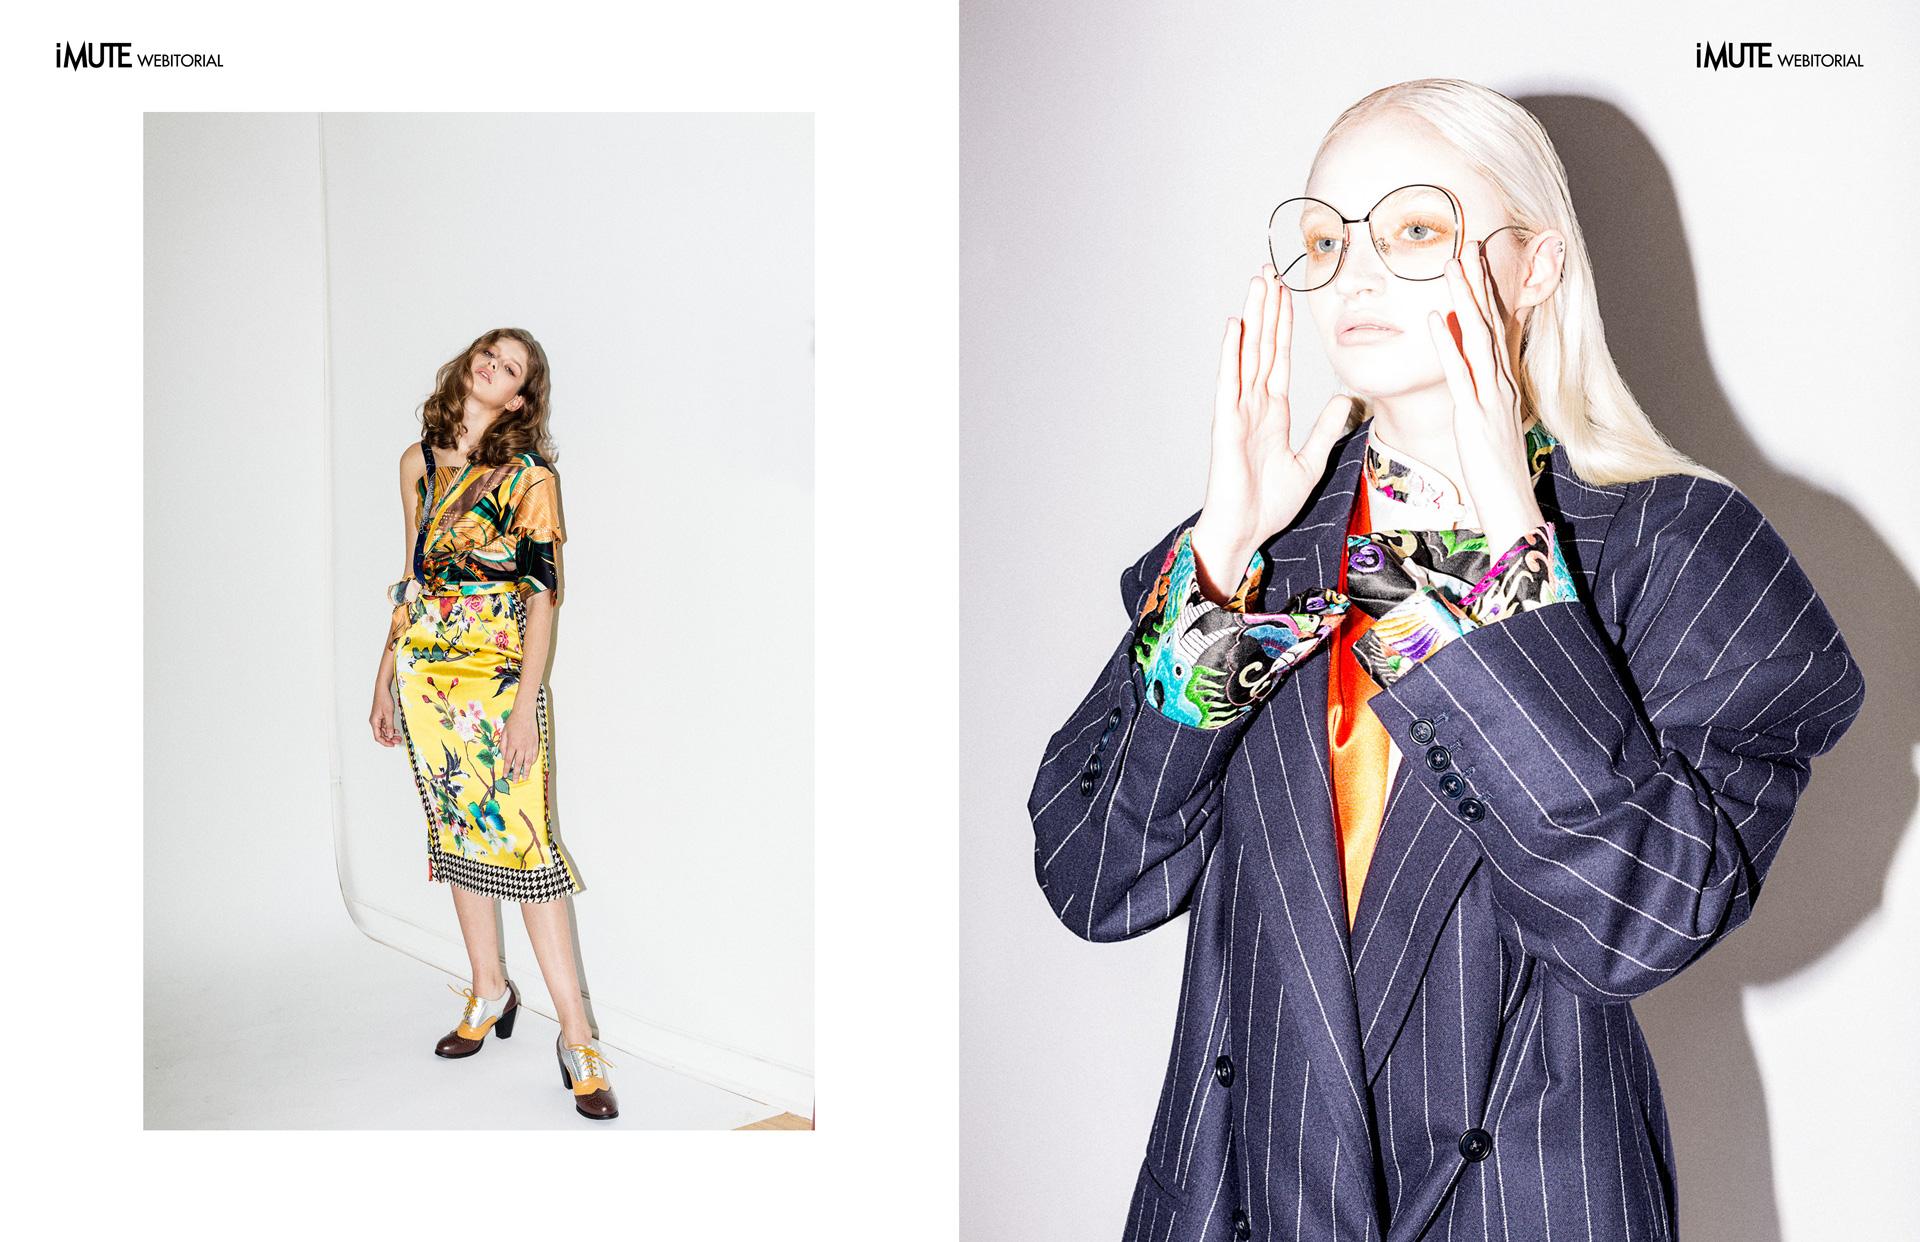 ODDITY webitorial for iMute Magazine Photographer   Kimiko Chan Model   Brii Hocutt & Izabela @ MSA Models Designer   Snow Xue Gao Make up   lulu Lin